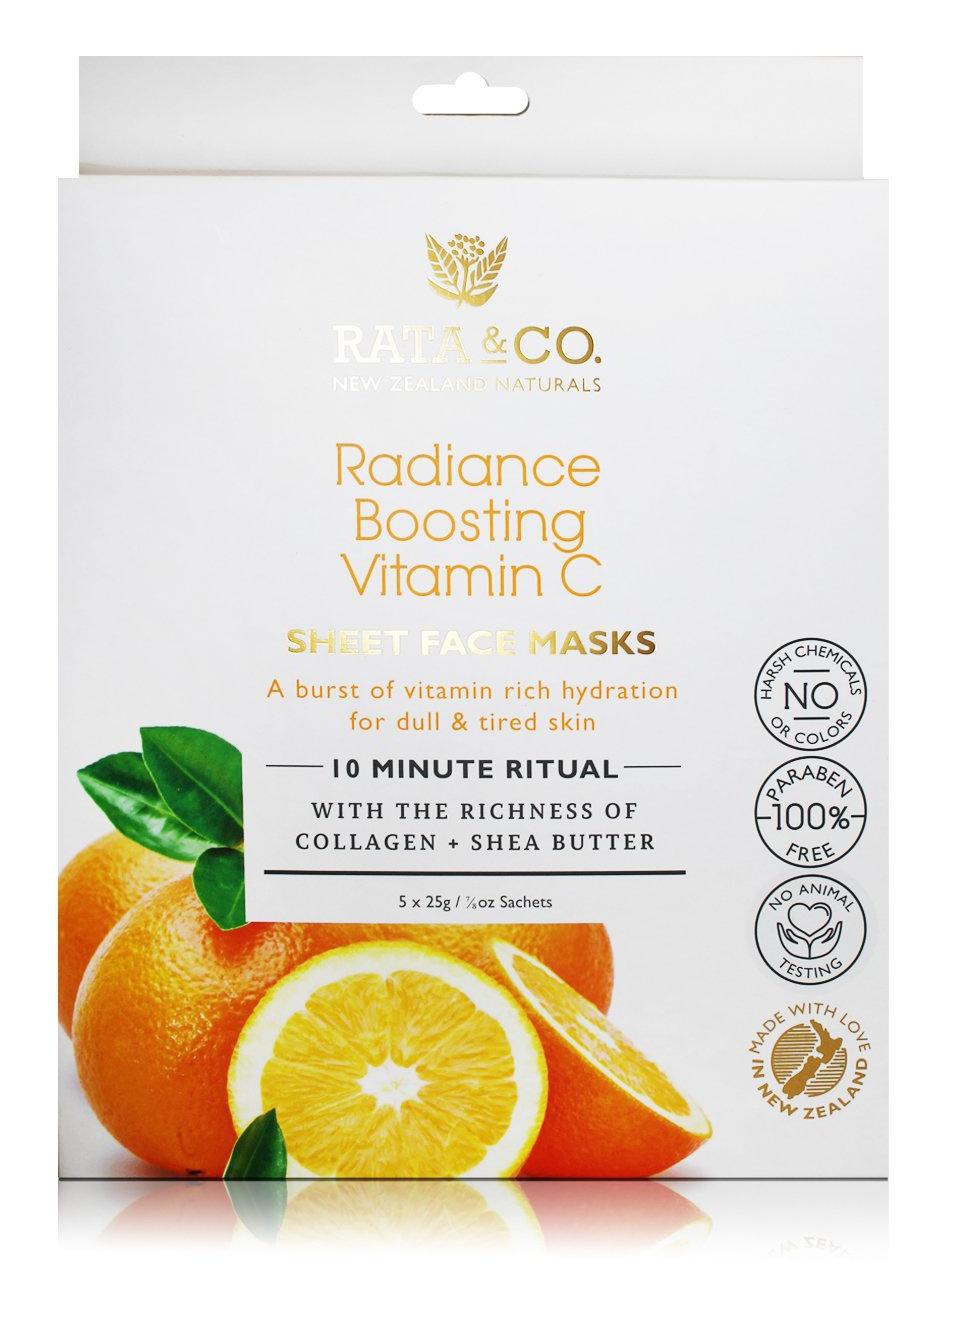 Rata & Co Radiance Boosting Vitamin C Sheet Face Masks